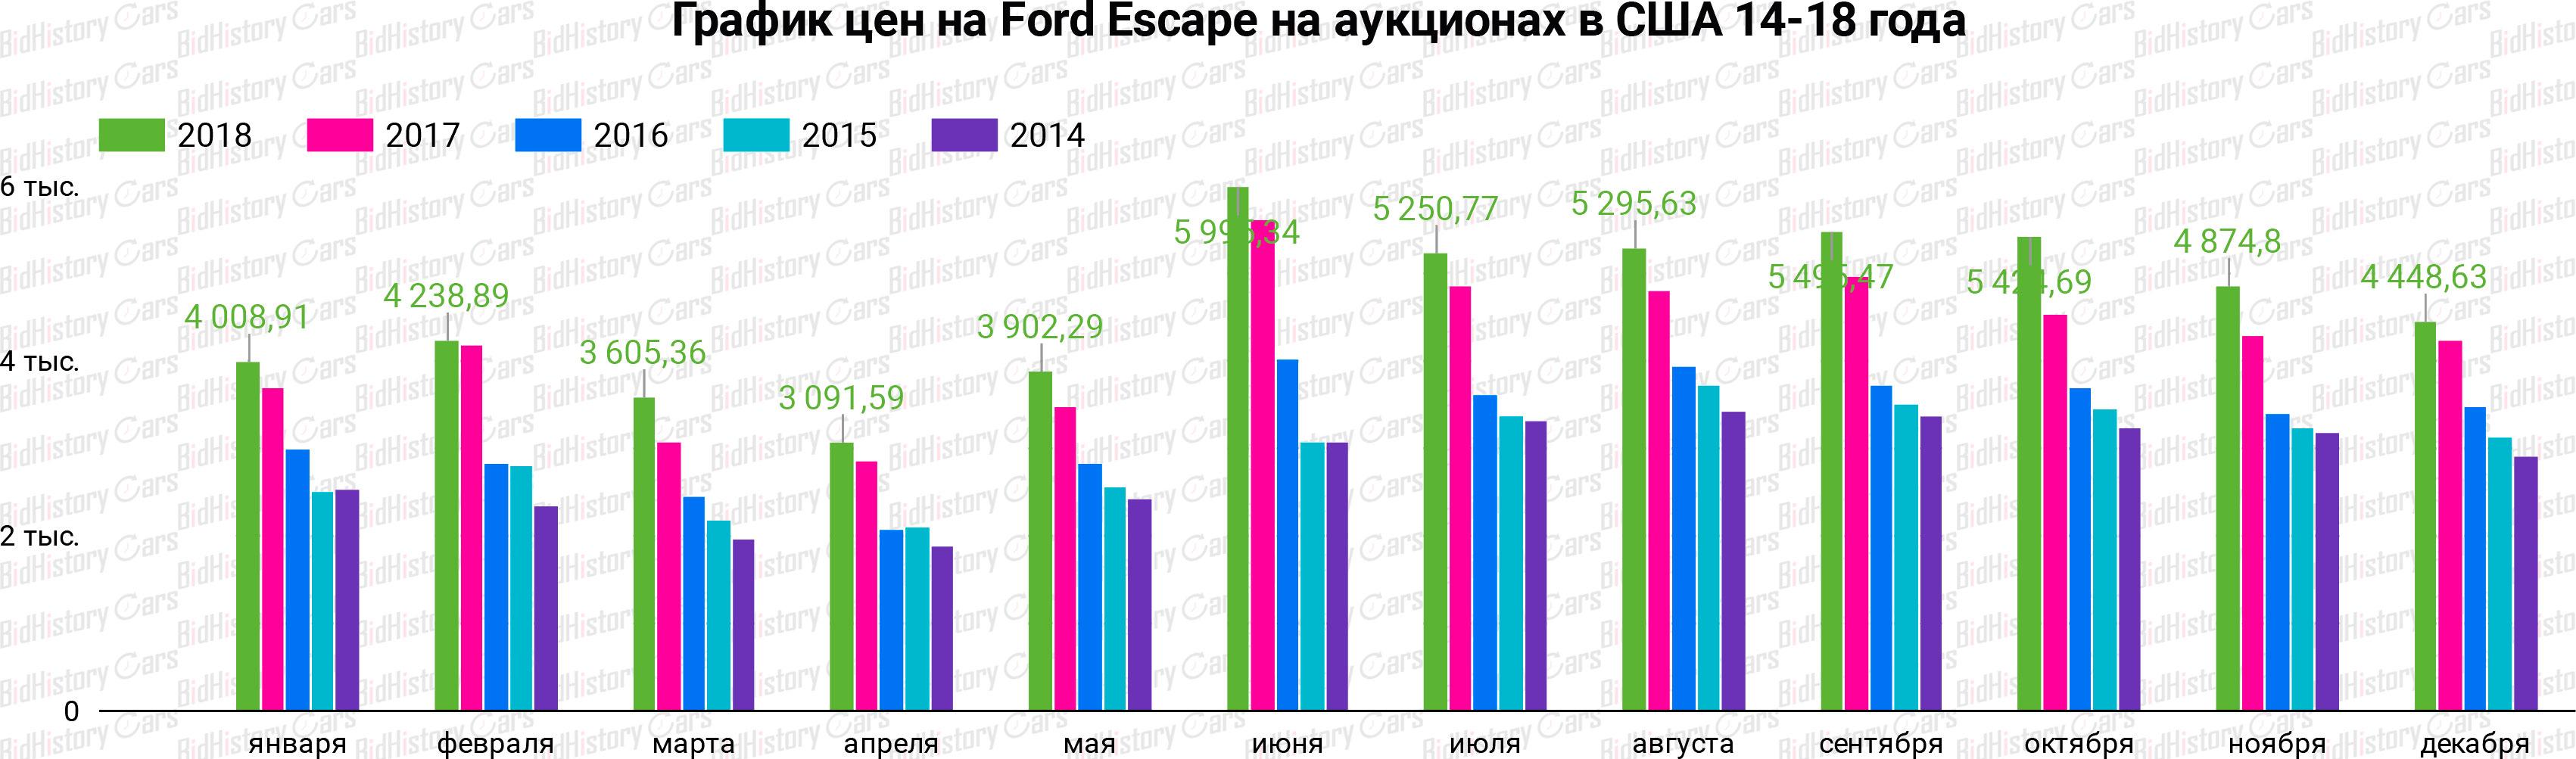 График цен Ford Escape на аукционах в США 14-18 года